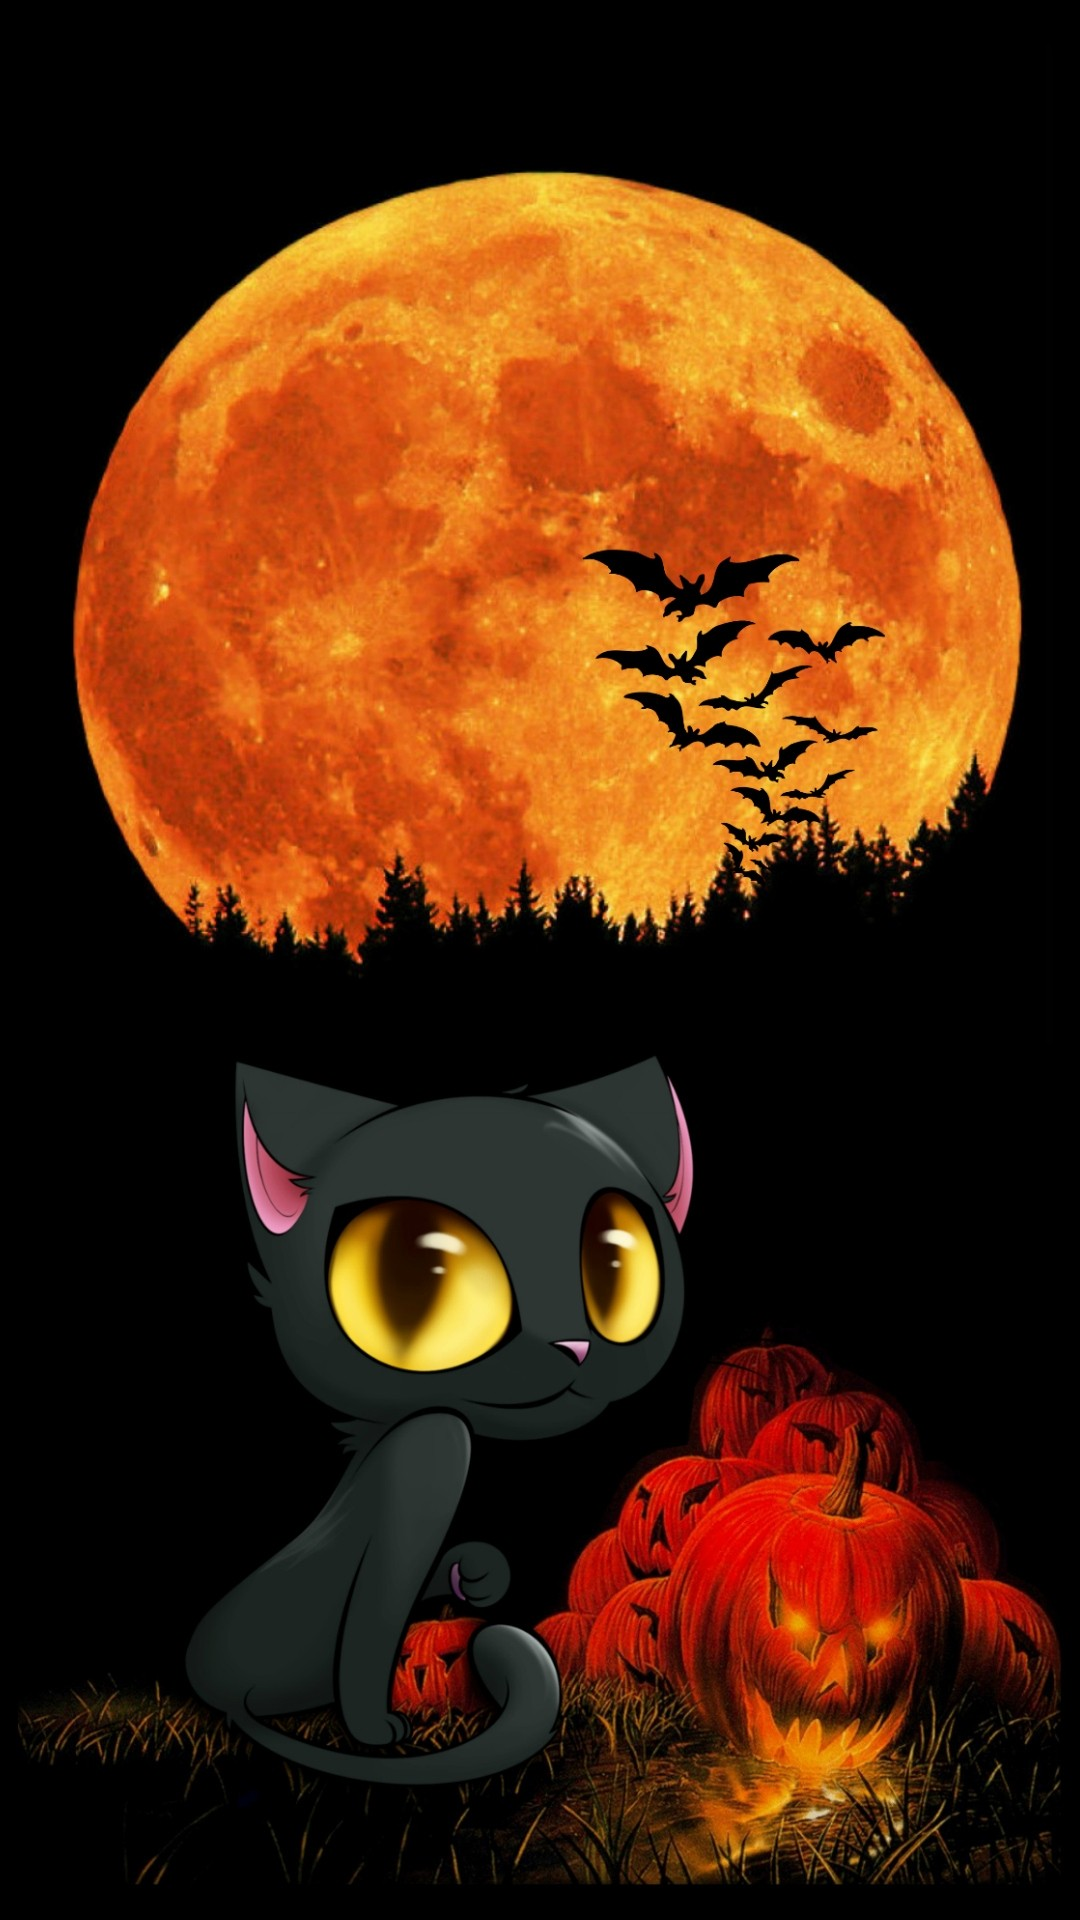 Cute Halloween iPhone 7 wallpaper